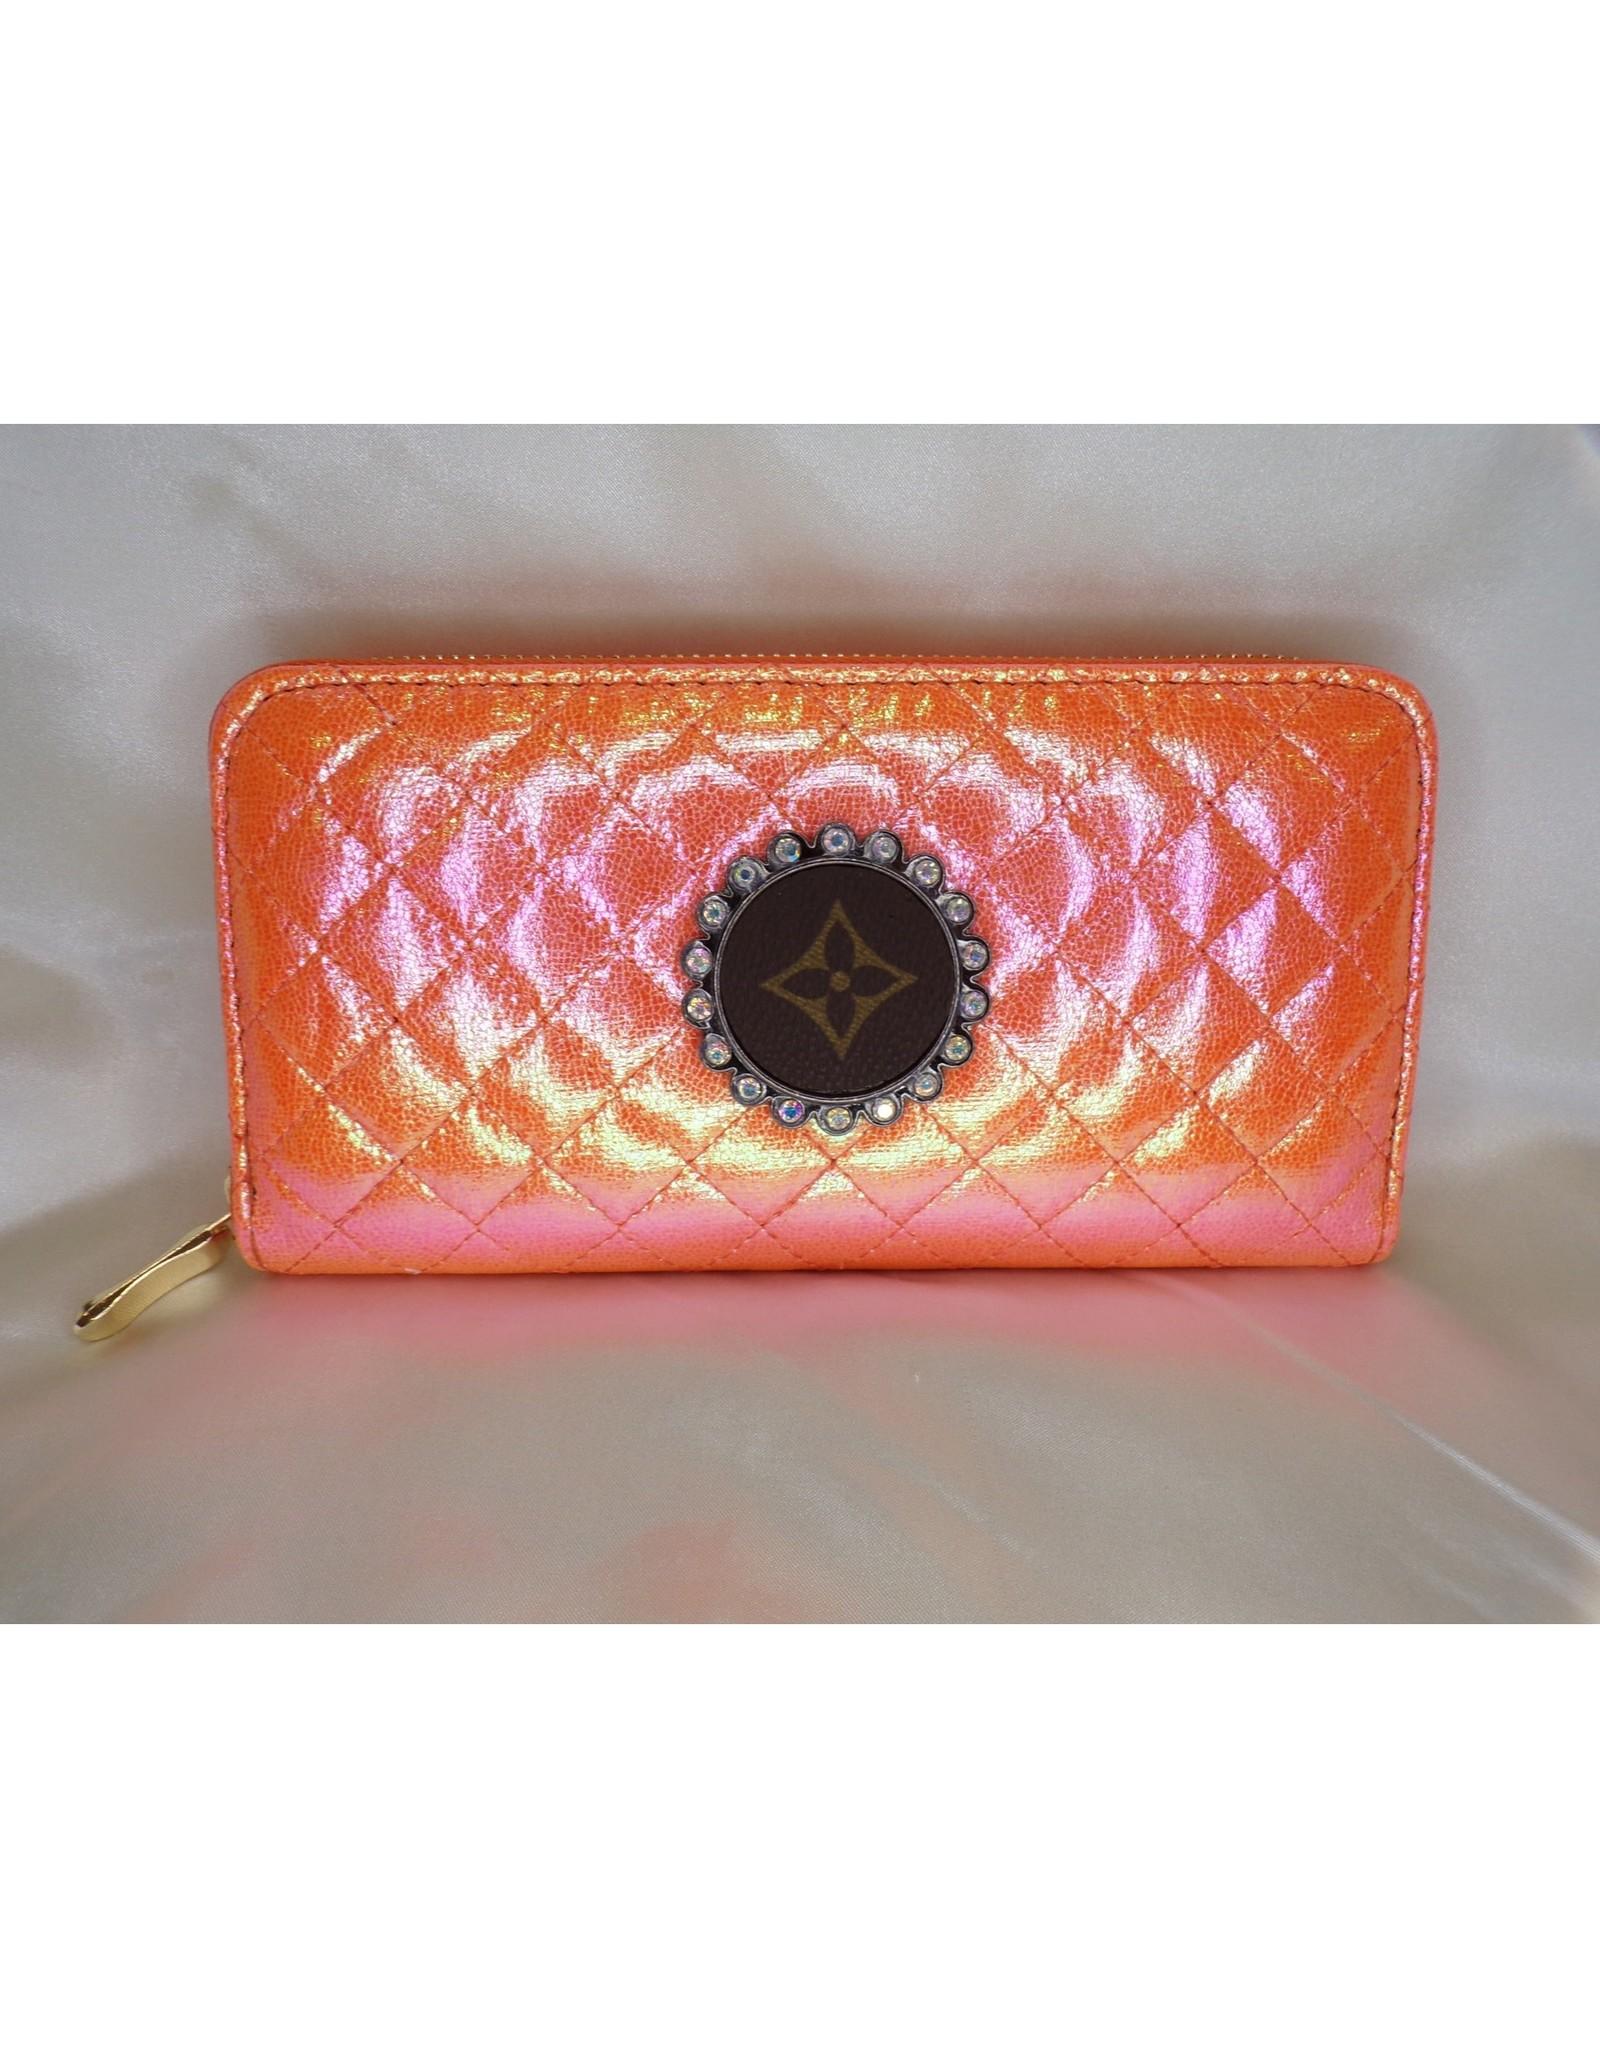 Lost Highway Customs Louis Vuitton Upcycled Metallic Orange Wallet